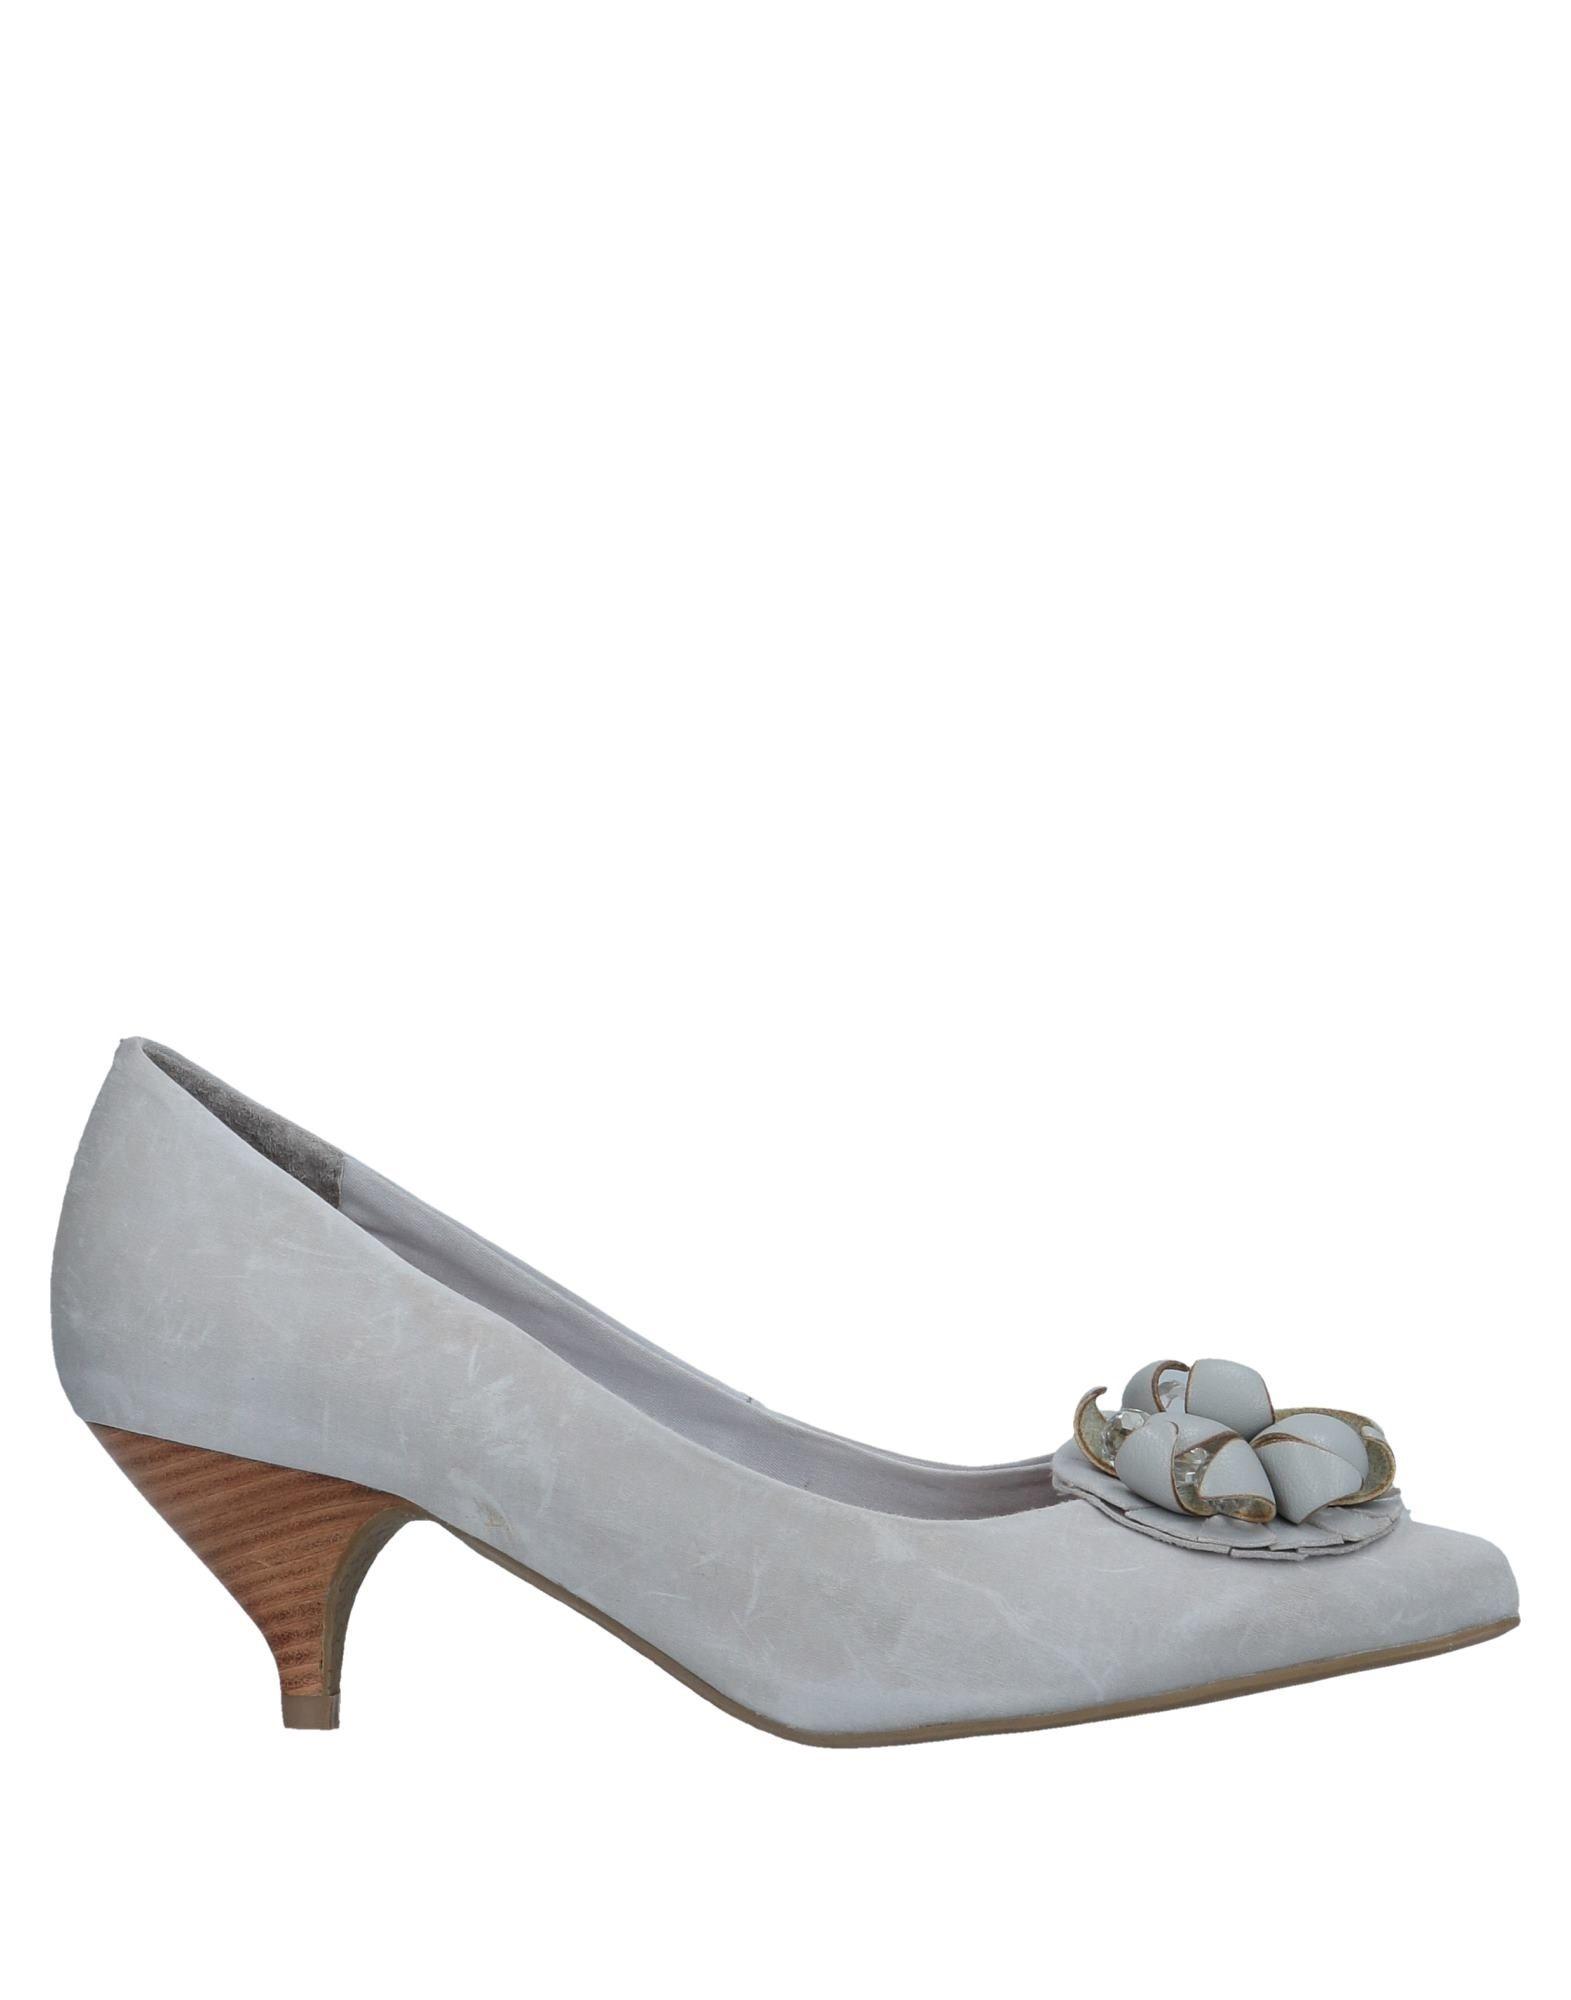 Sandali Nuove Marian Donna - 11563937CJ Nuove Sandali offerte e scarpe comode 7ed100